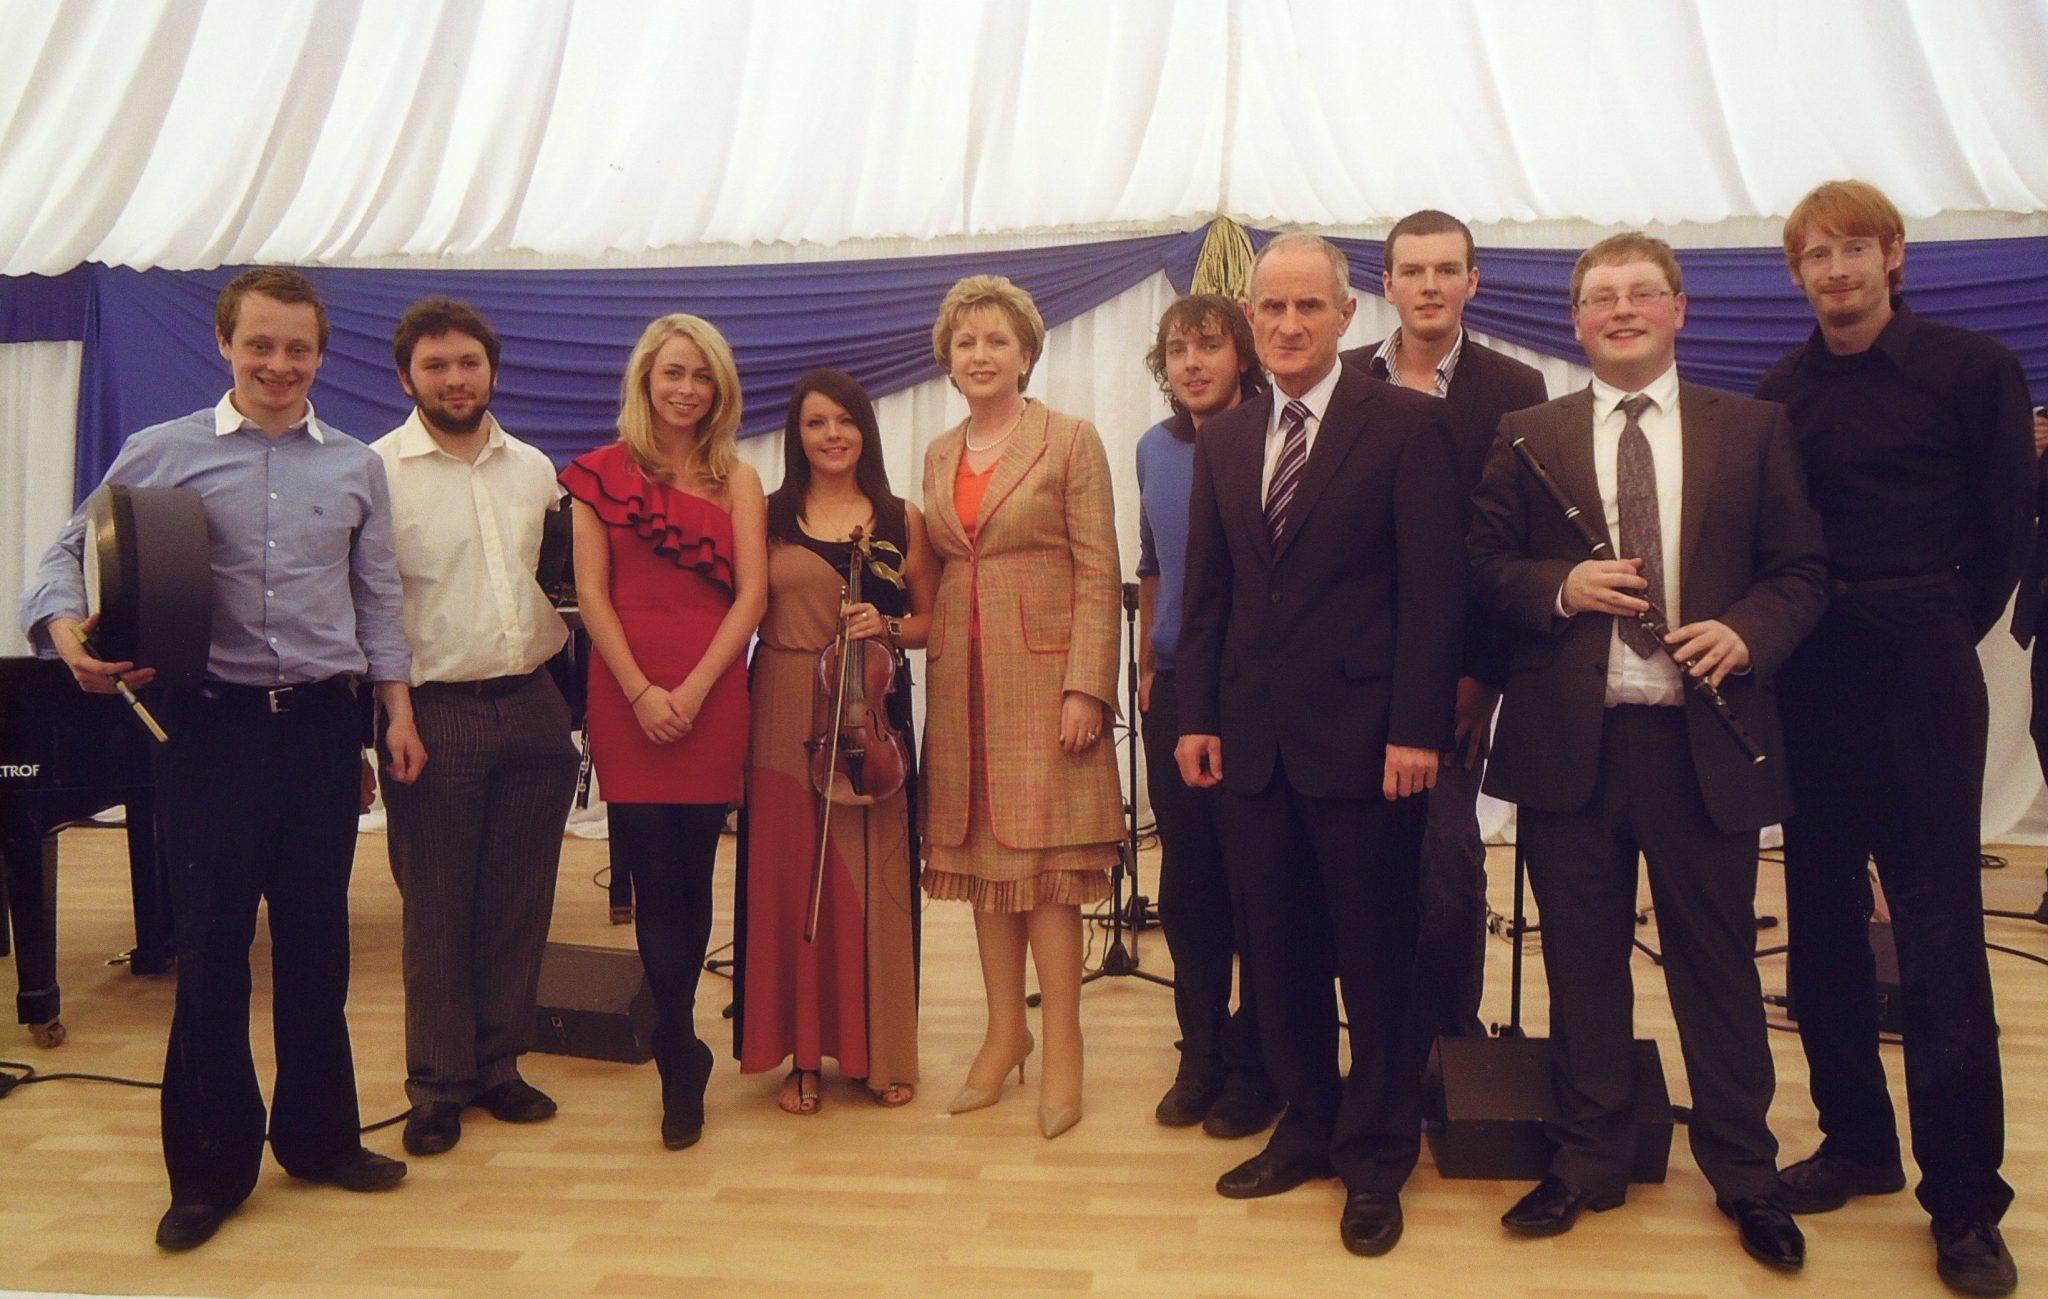 Garden Party at Aras an Uachtaráin with President Mary McAleese